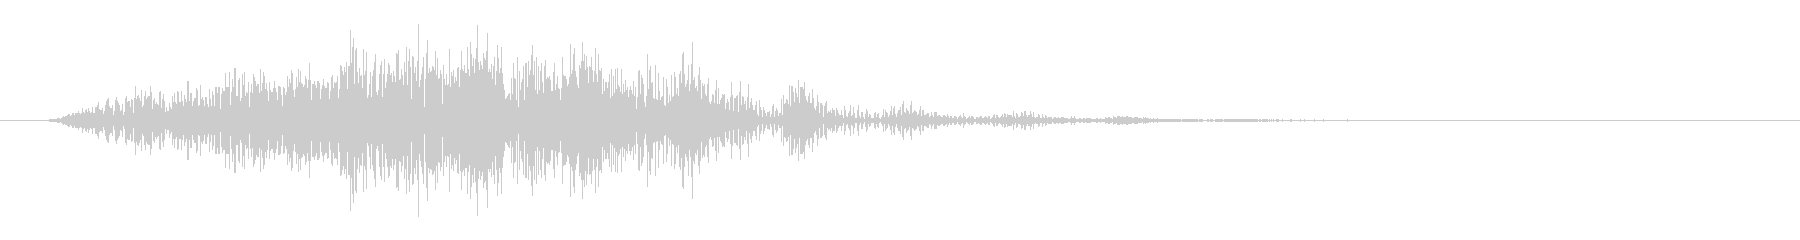 SF 移動音11の未再生の波形